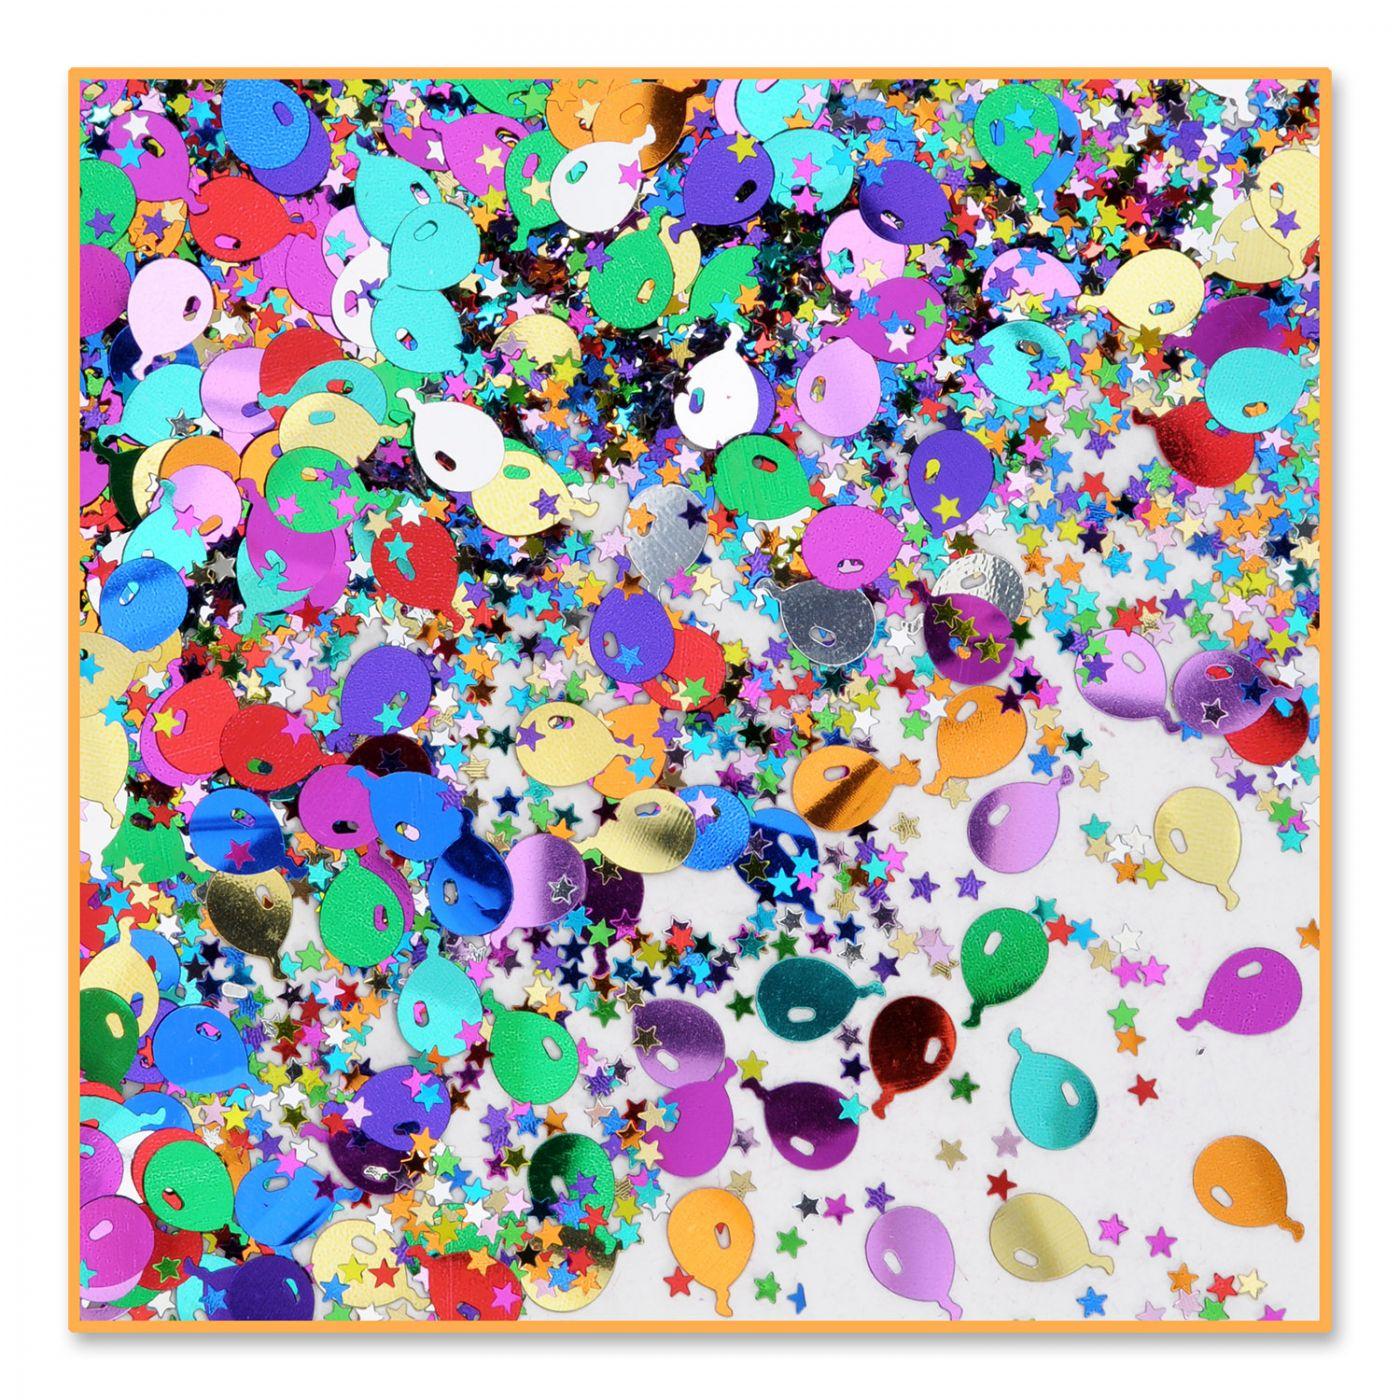 Image of Balloons & Stars Confetti (6)